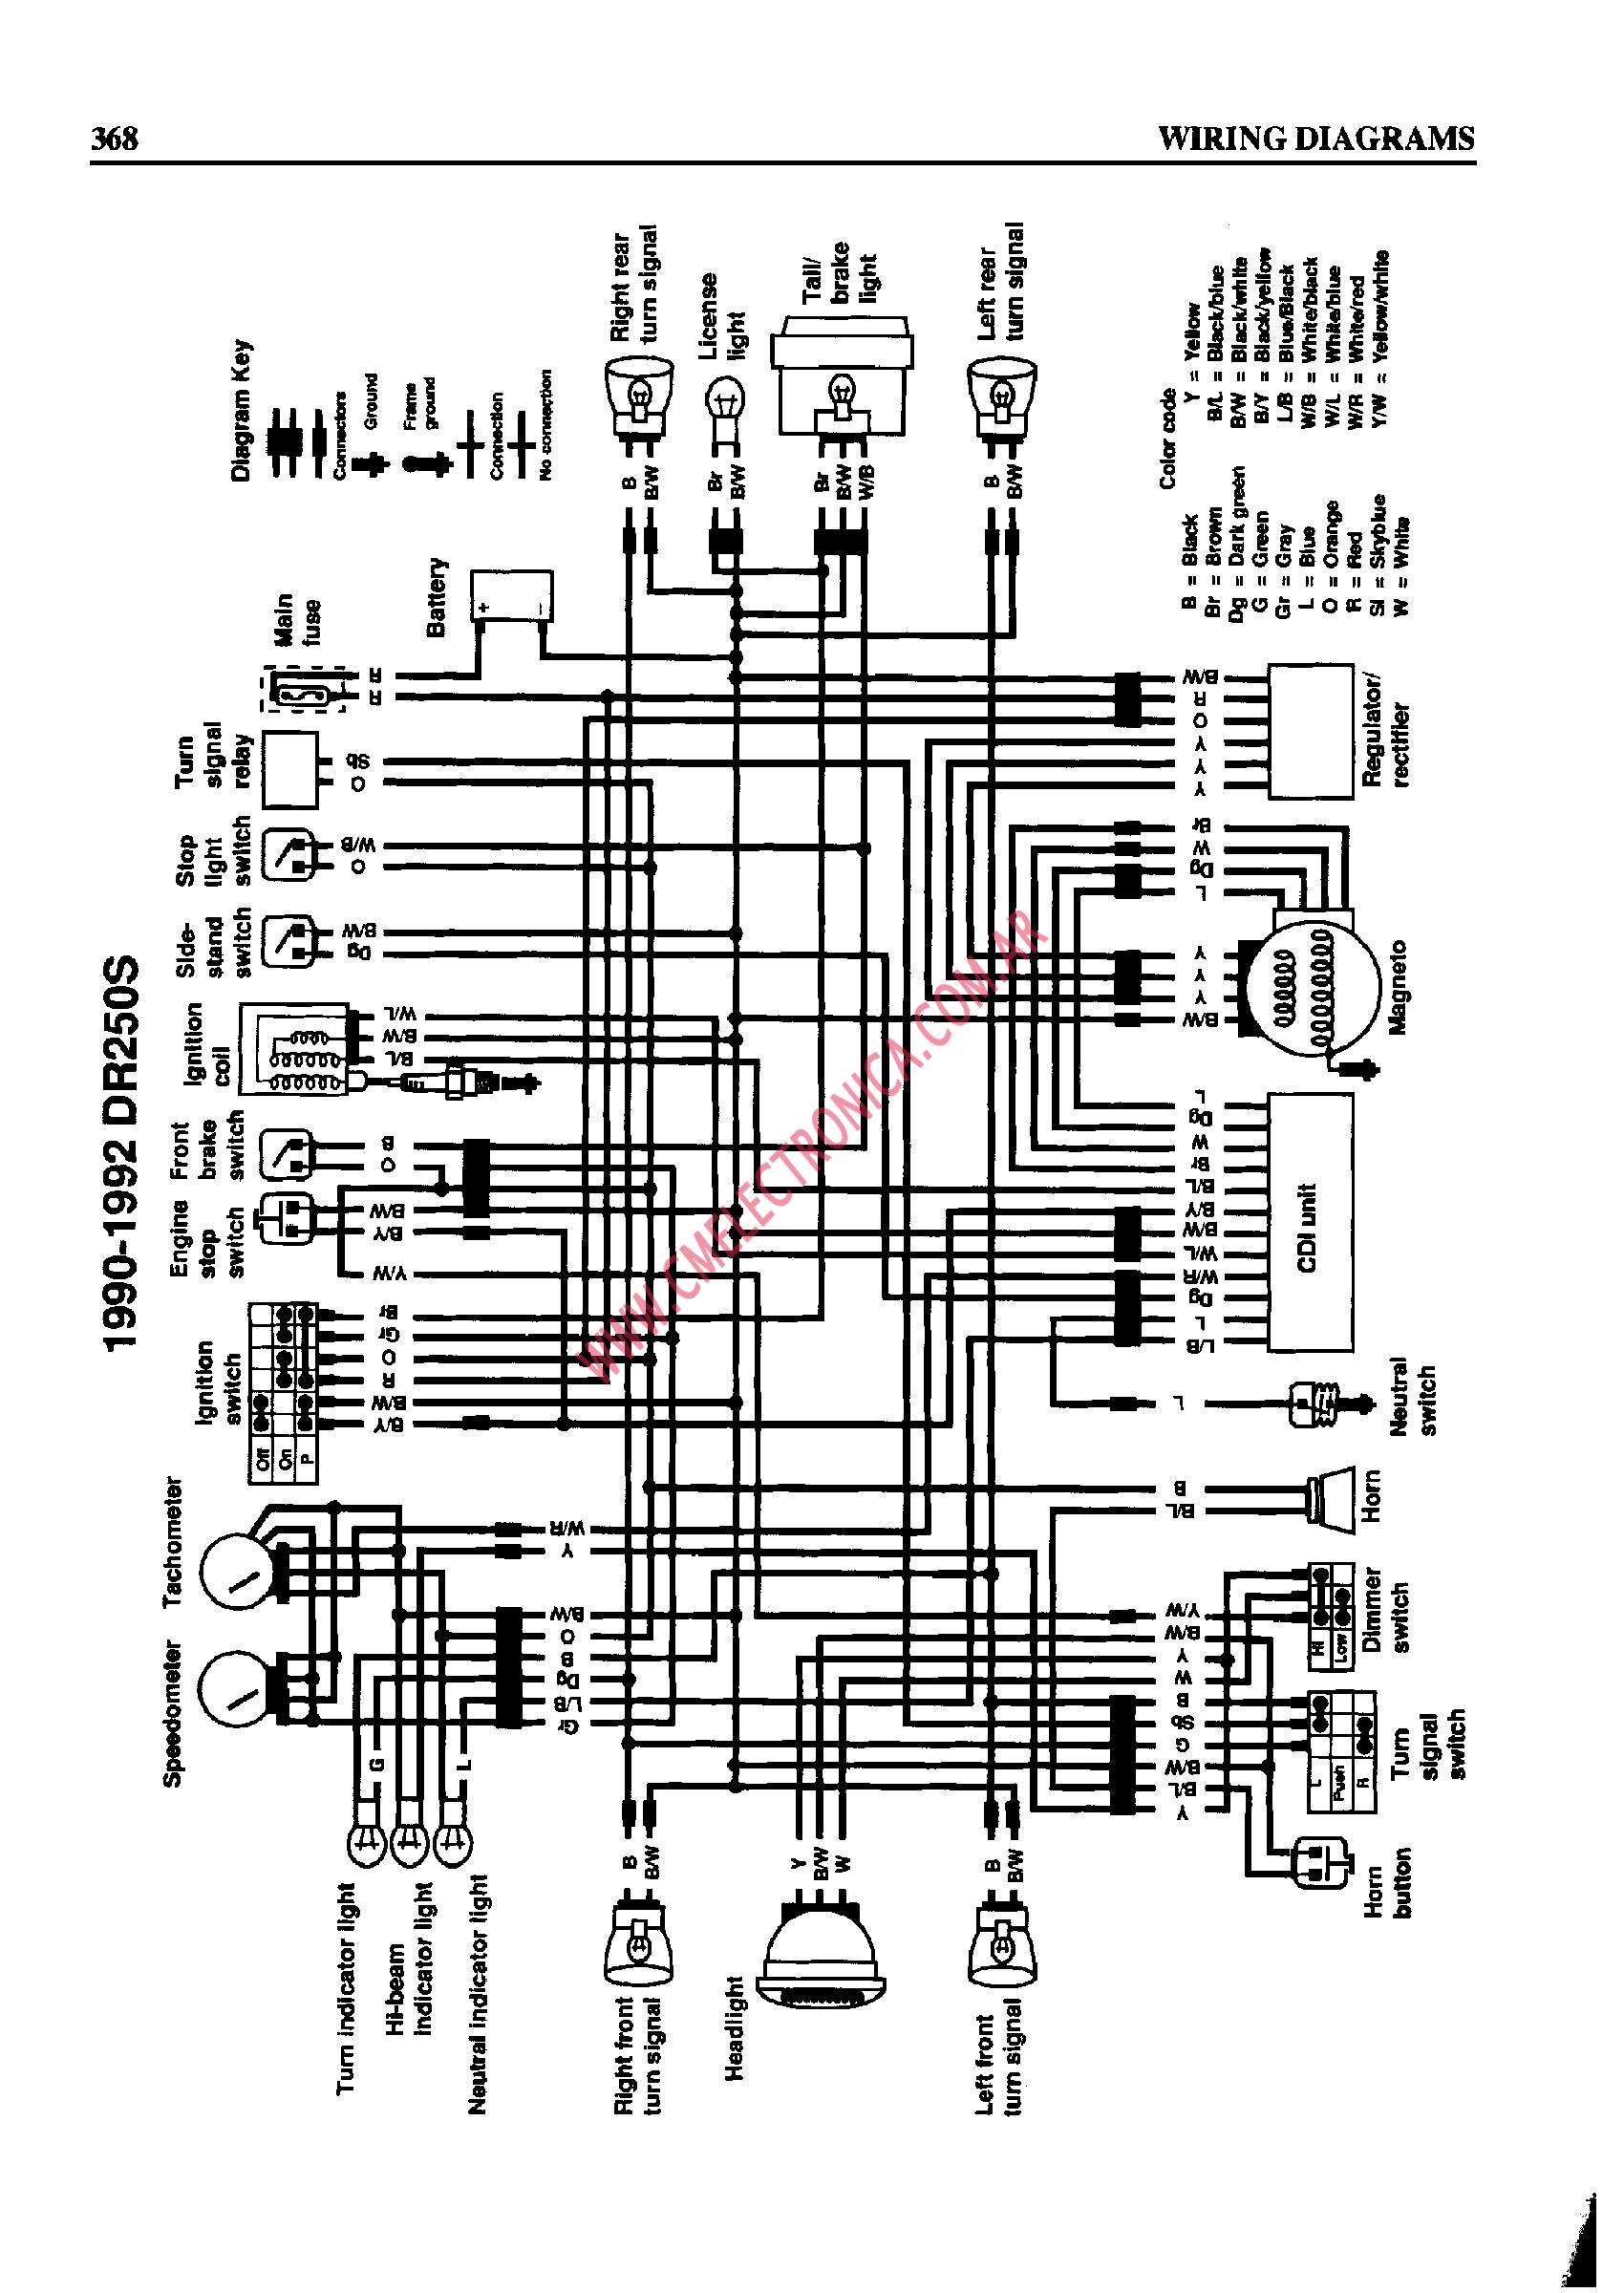 Honda Ruckus Fuse Box Honda Ruckus Gear Box Wiring Diagram